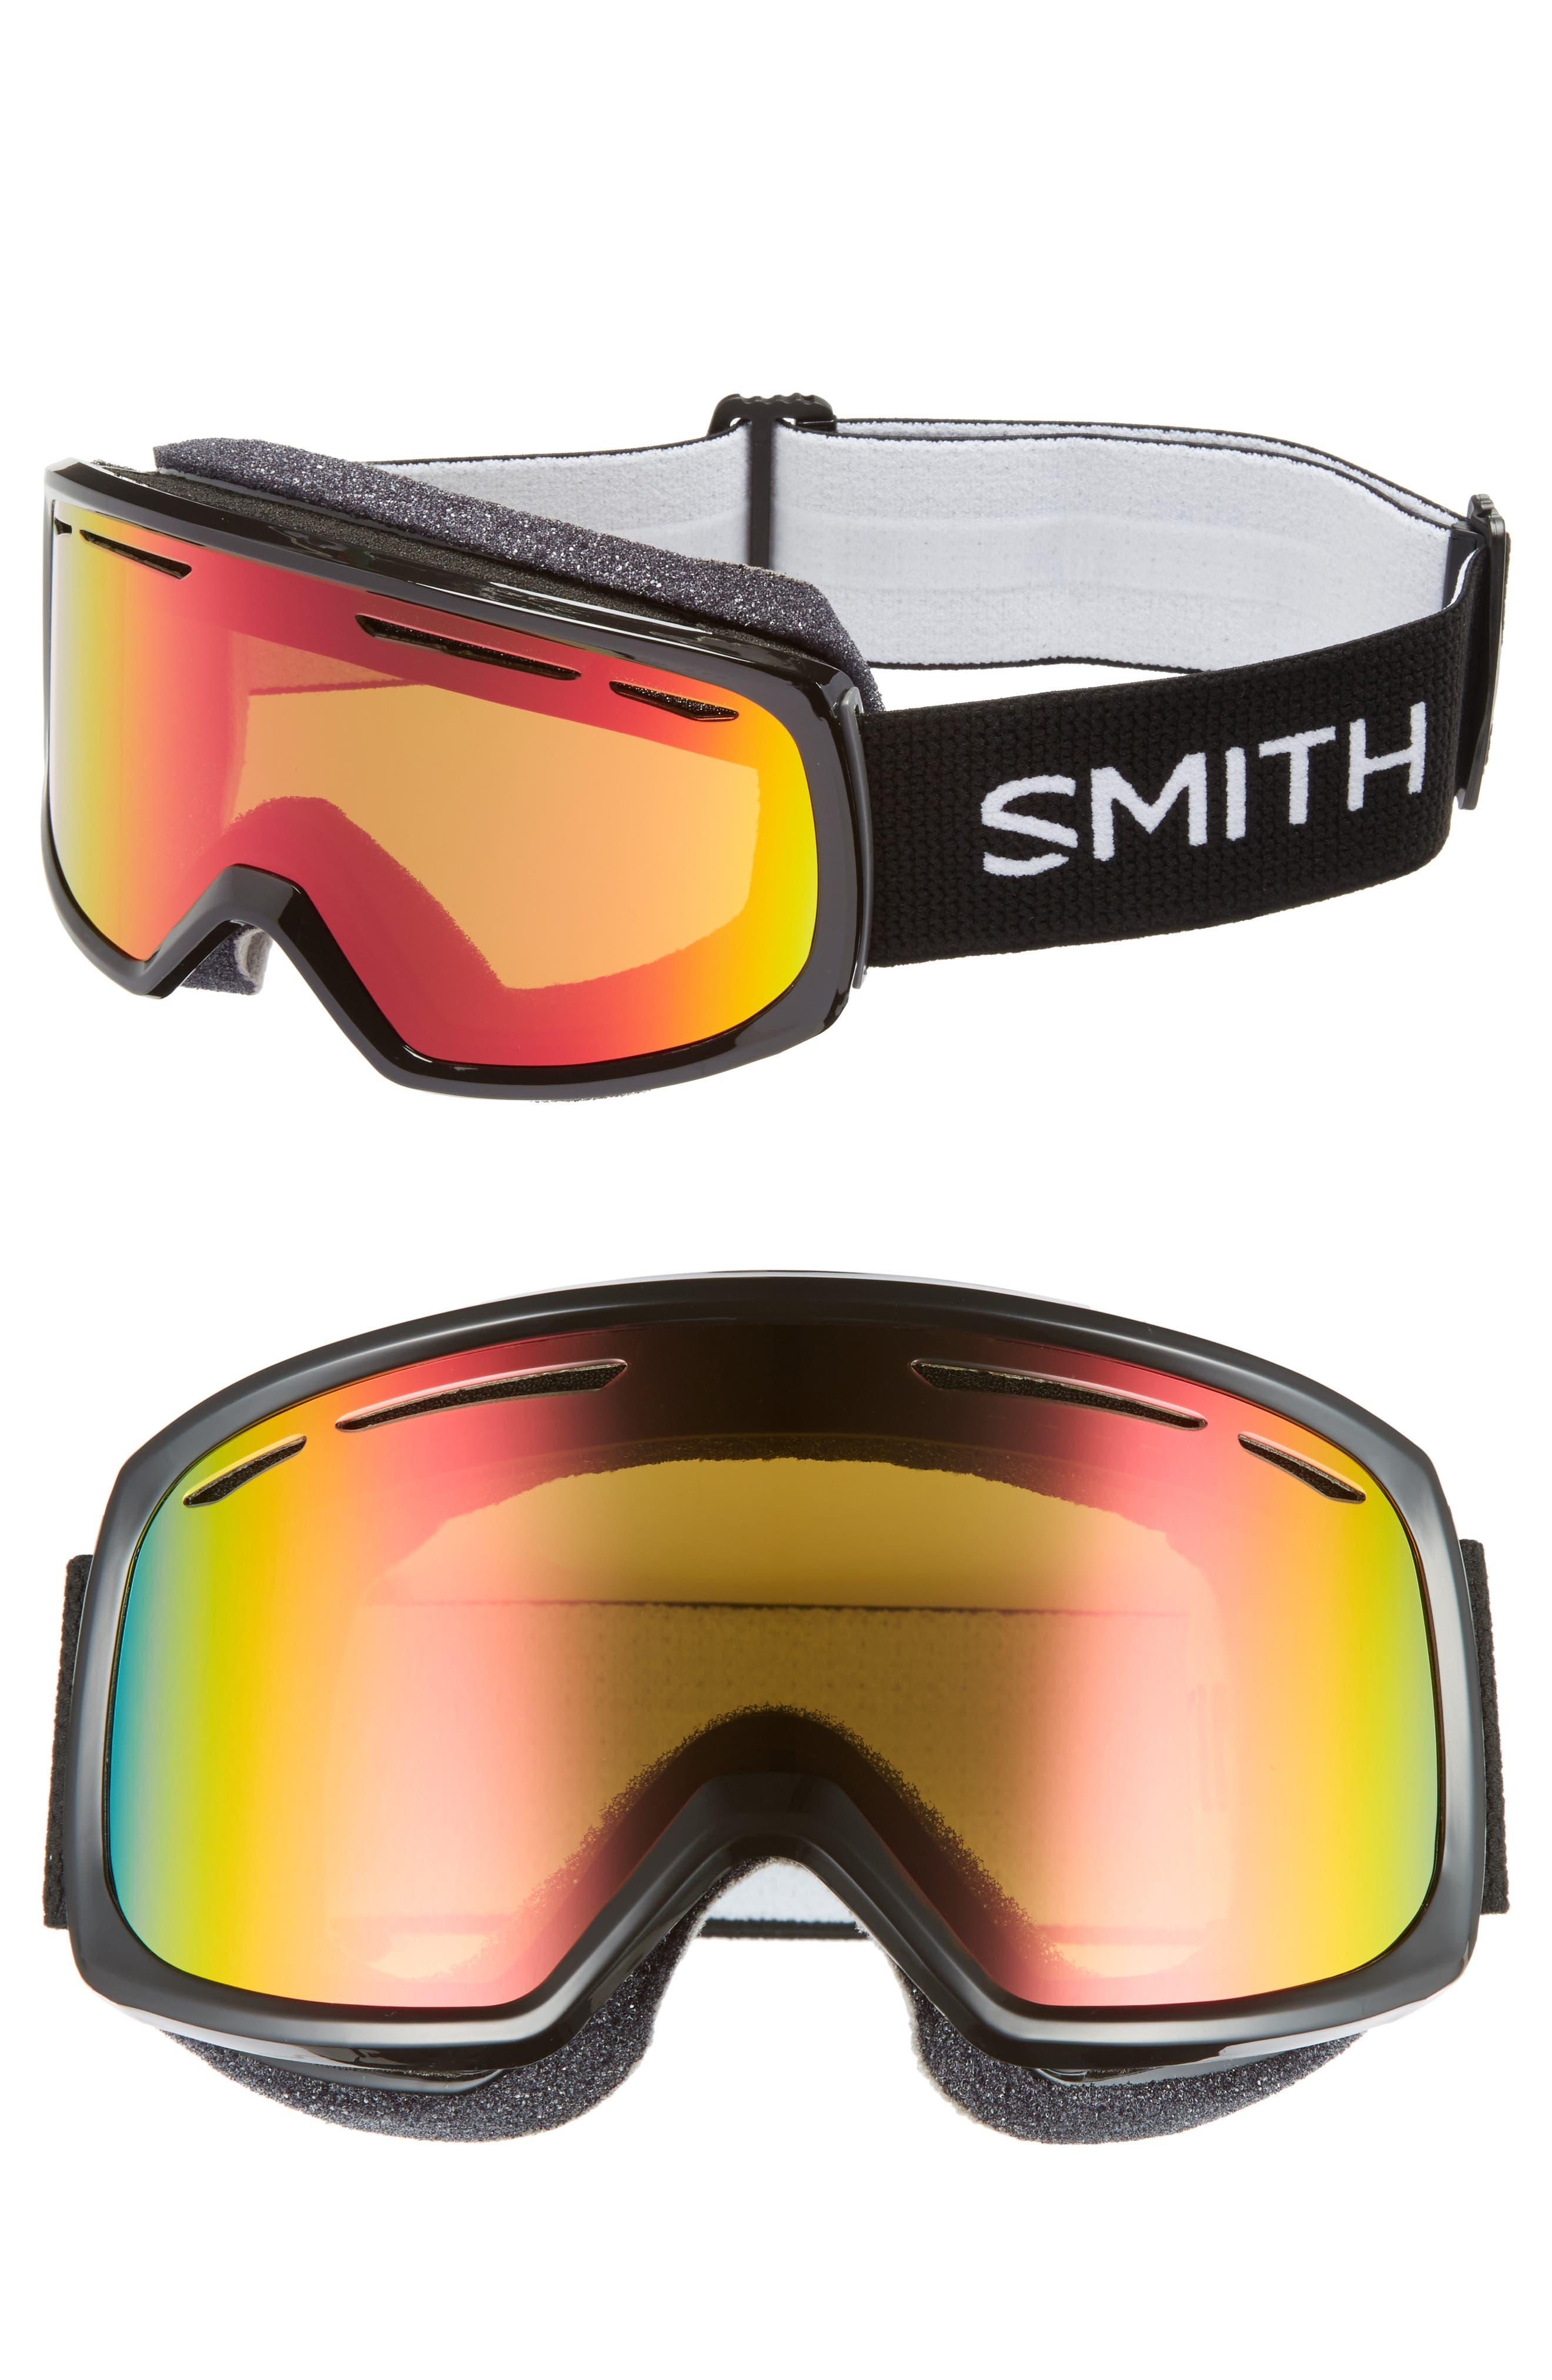 Drift Snow Goggles,                             Main thumbnail 1, color,                             BLACK/ MIRROR